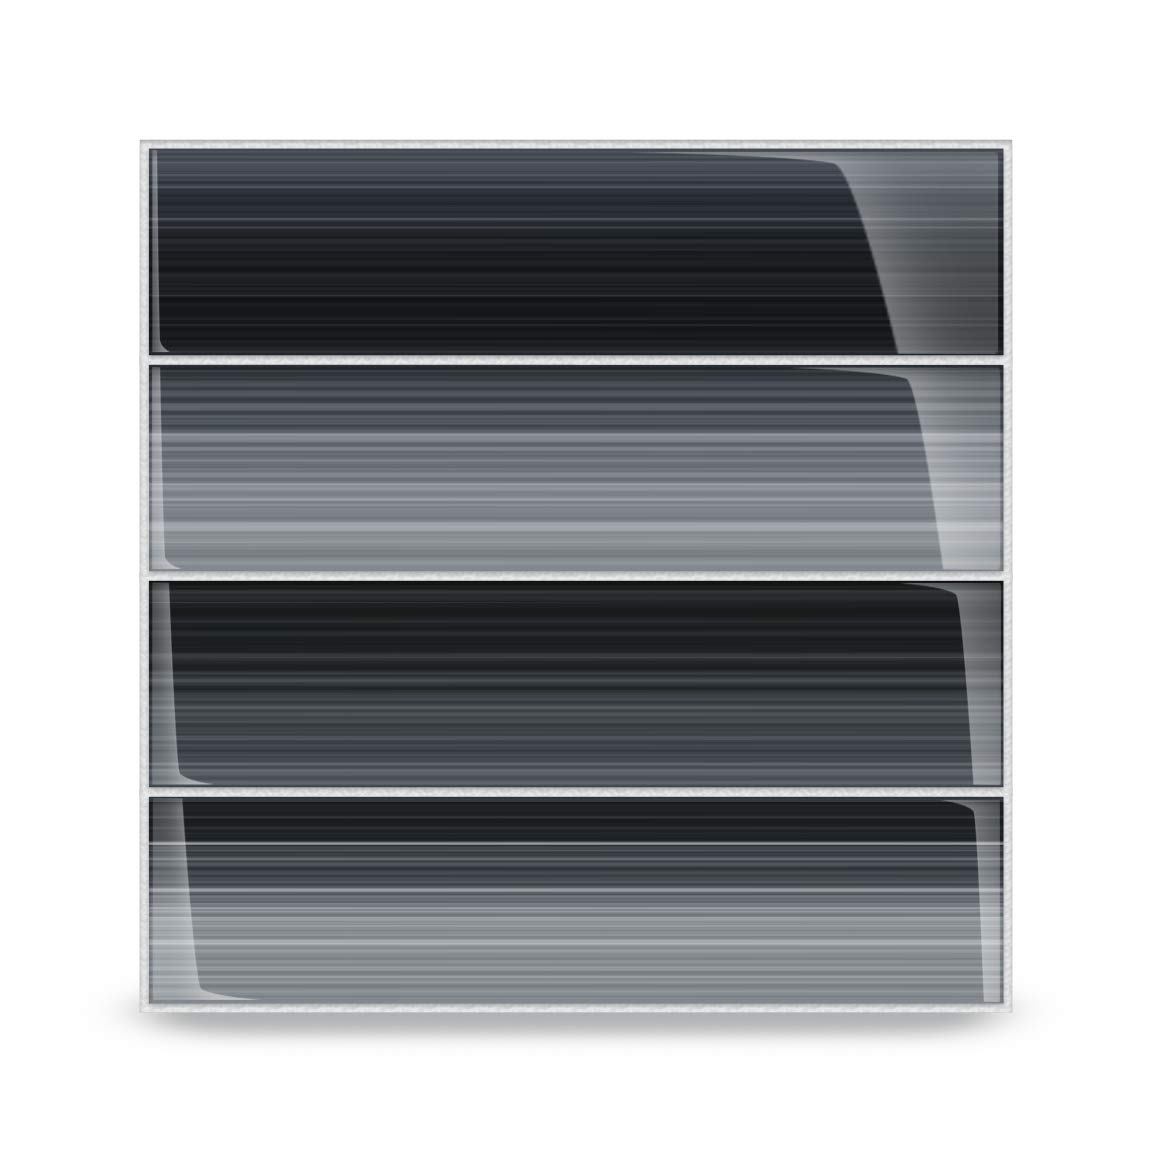 Bodesi Late Night Glass Subway Tile for Kitchen Backsplash or Bathroom, 3x12